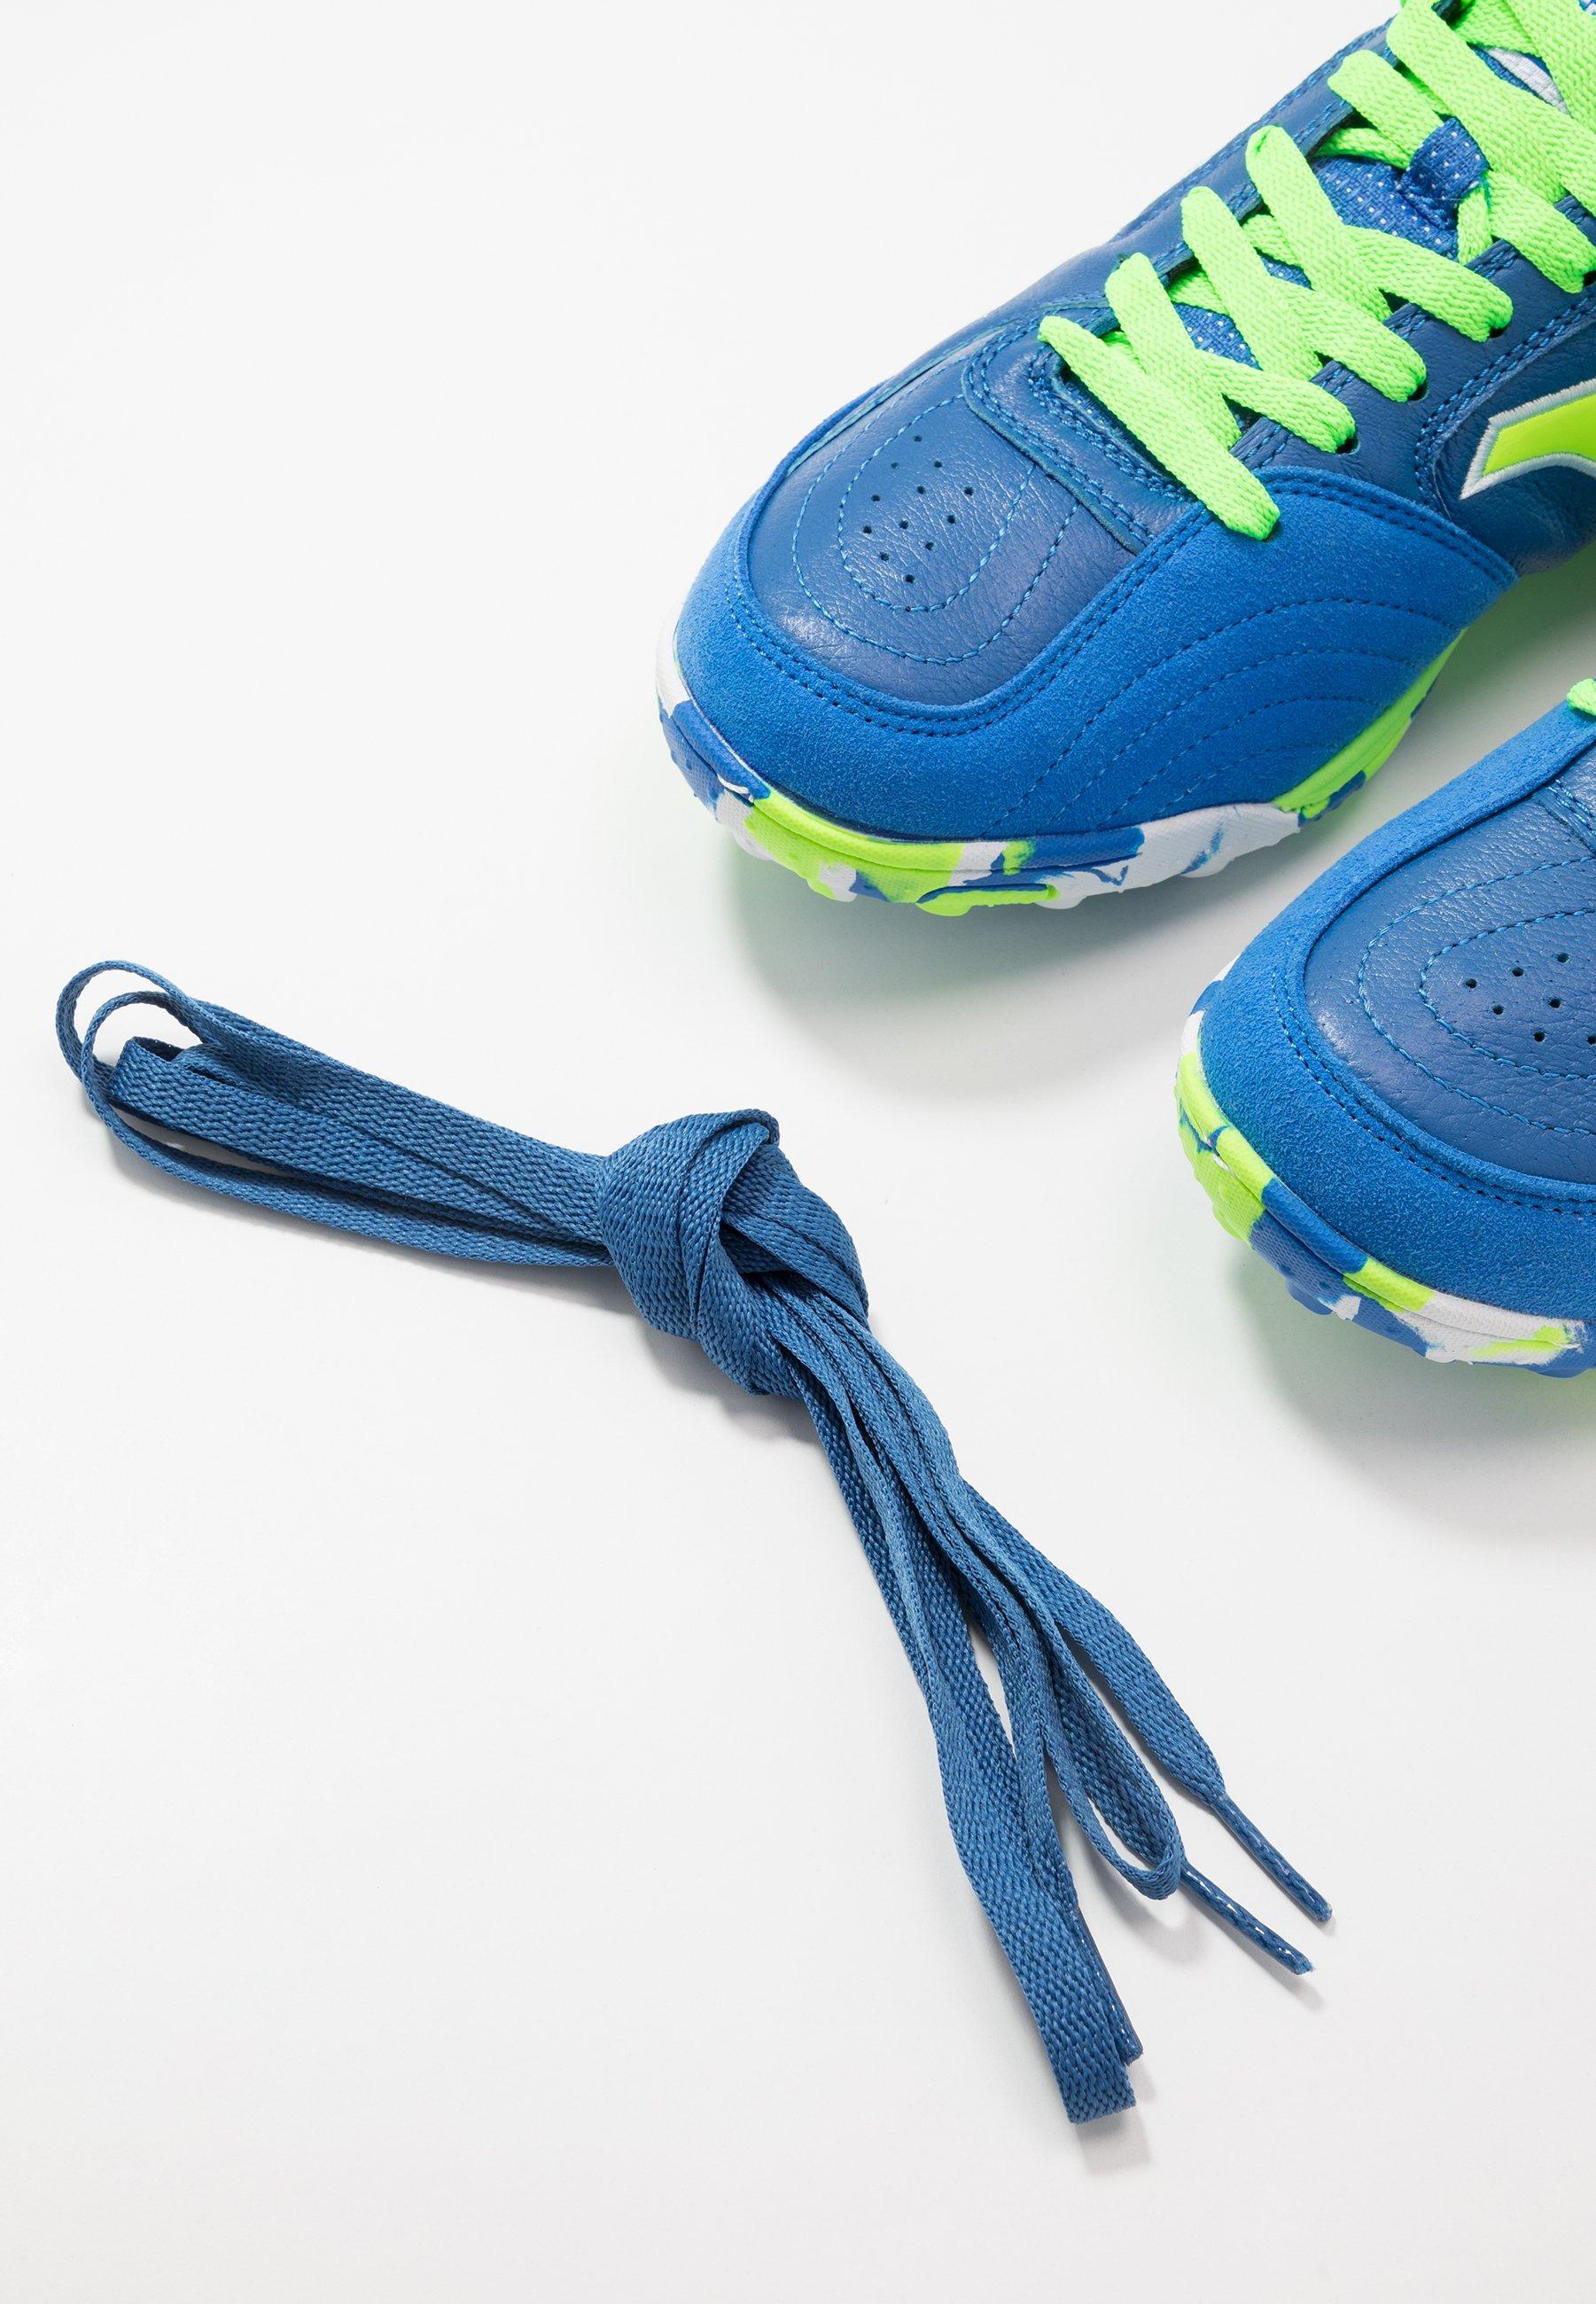 Joma Top Flex - Fotballsko For Kunstgress Blue/green